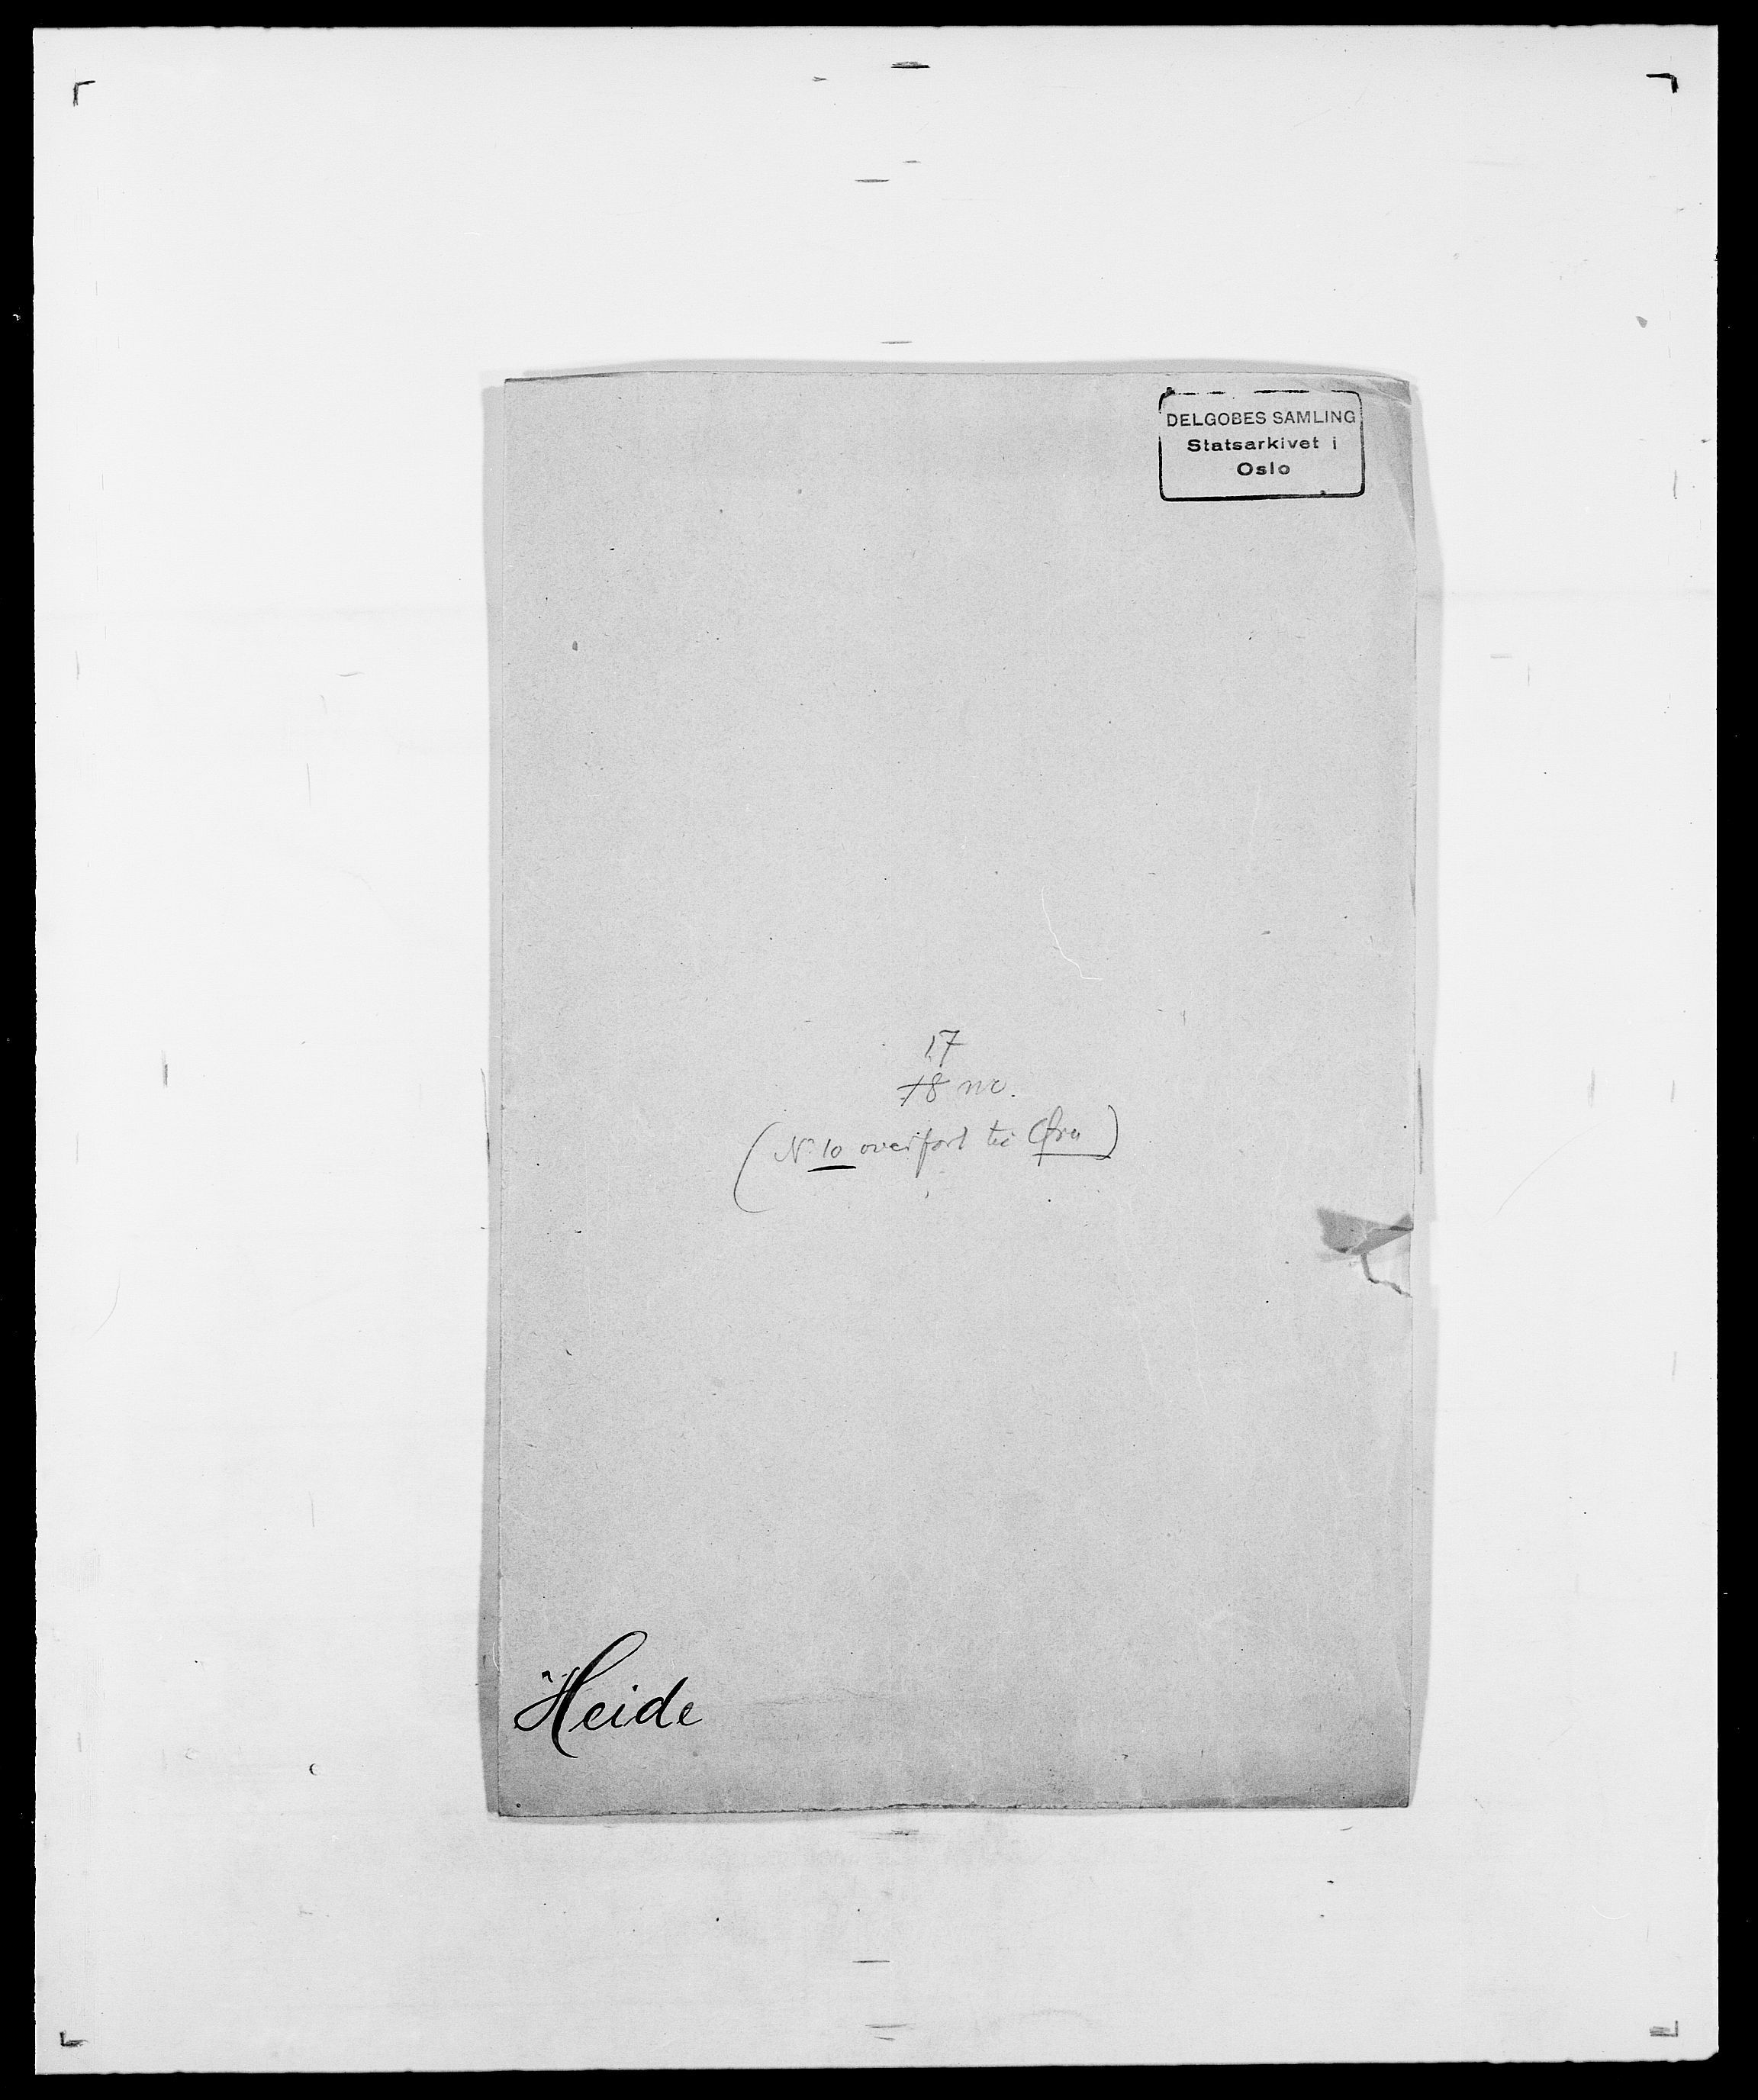 SAO, Delgobe, Charles Antoine - samling, D/Da/L0016: Hamborg - Hektoen, s. 788